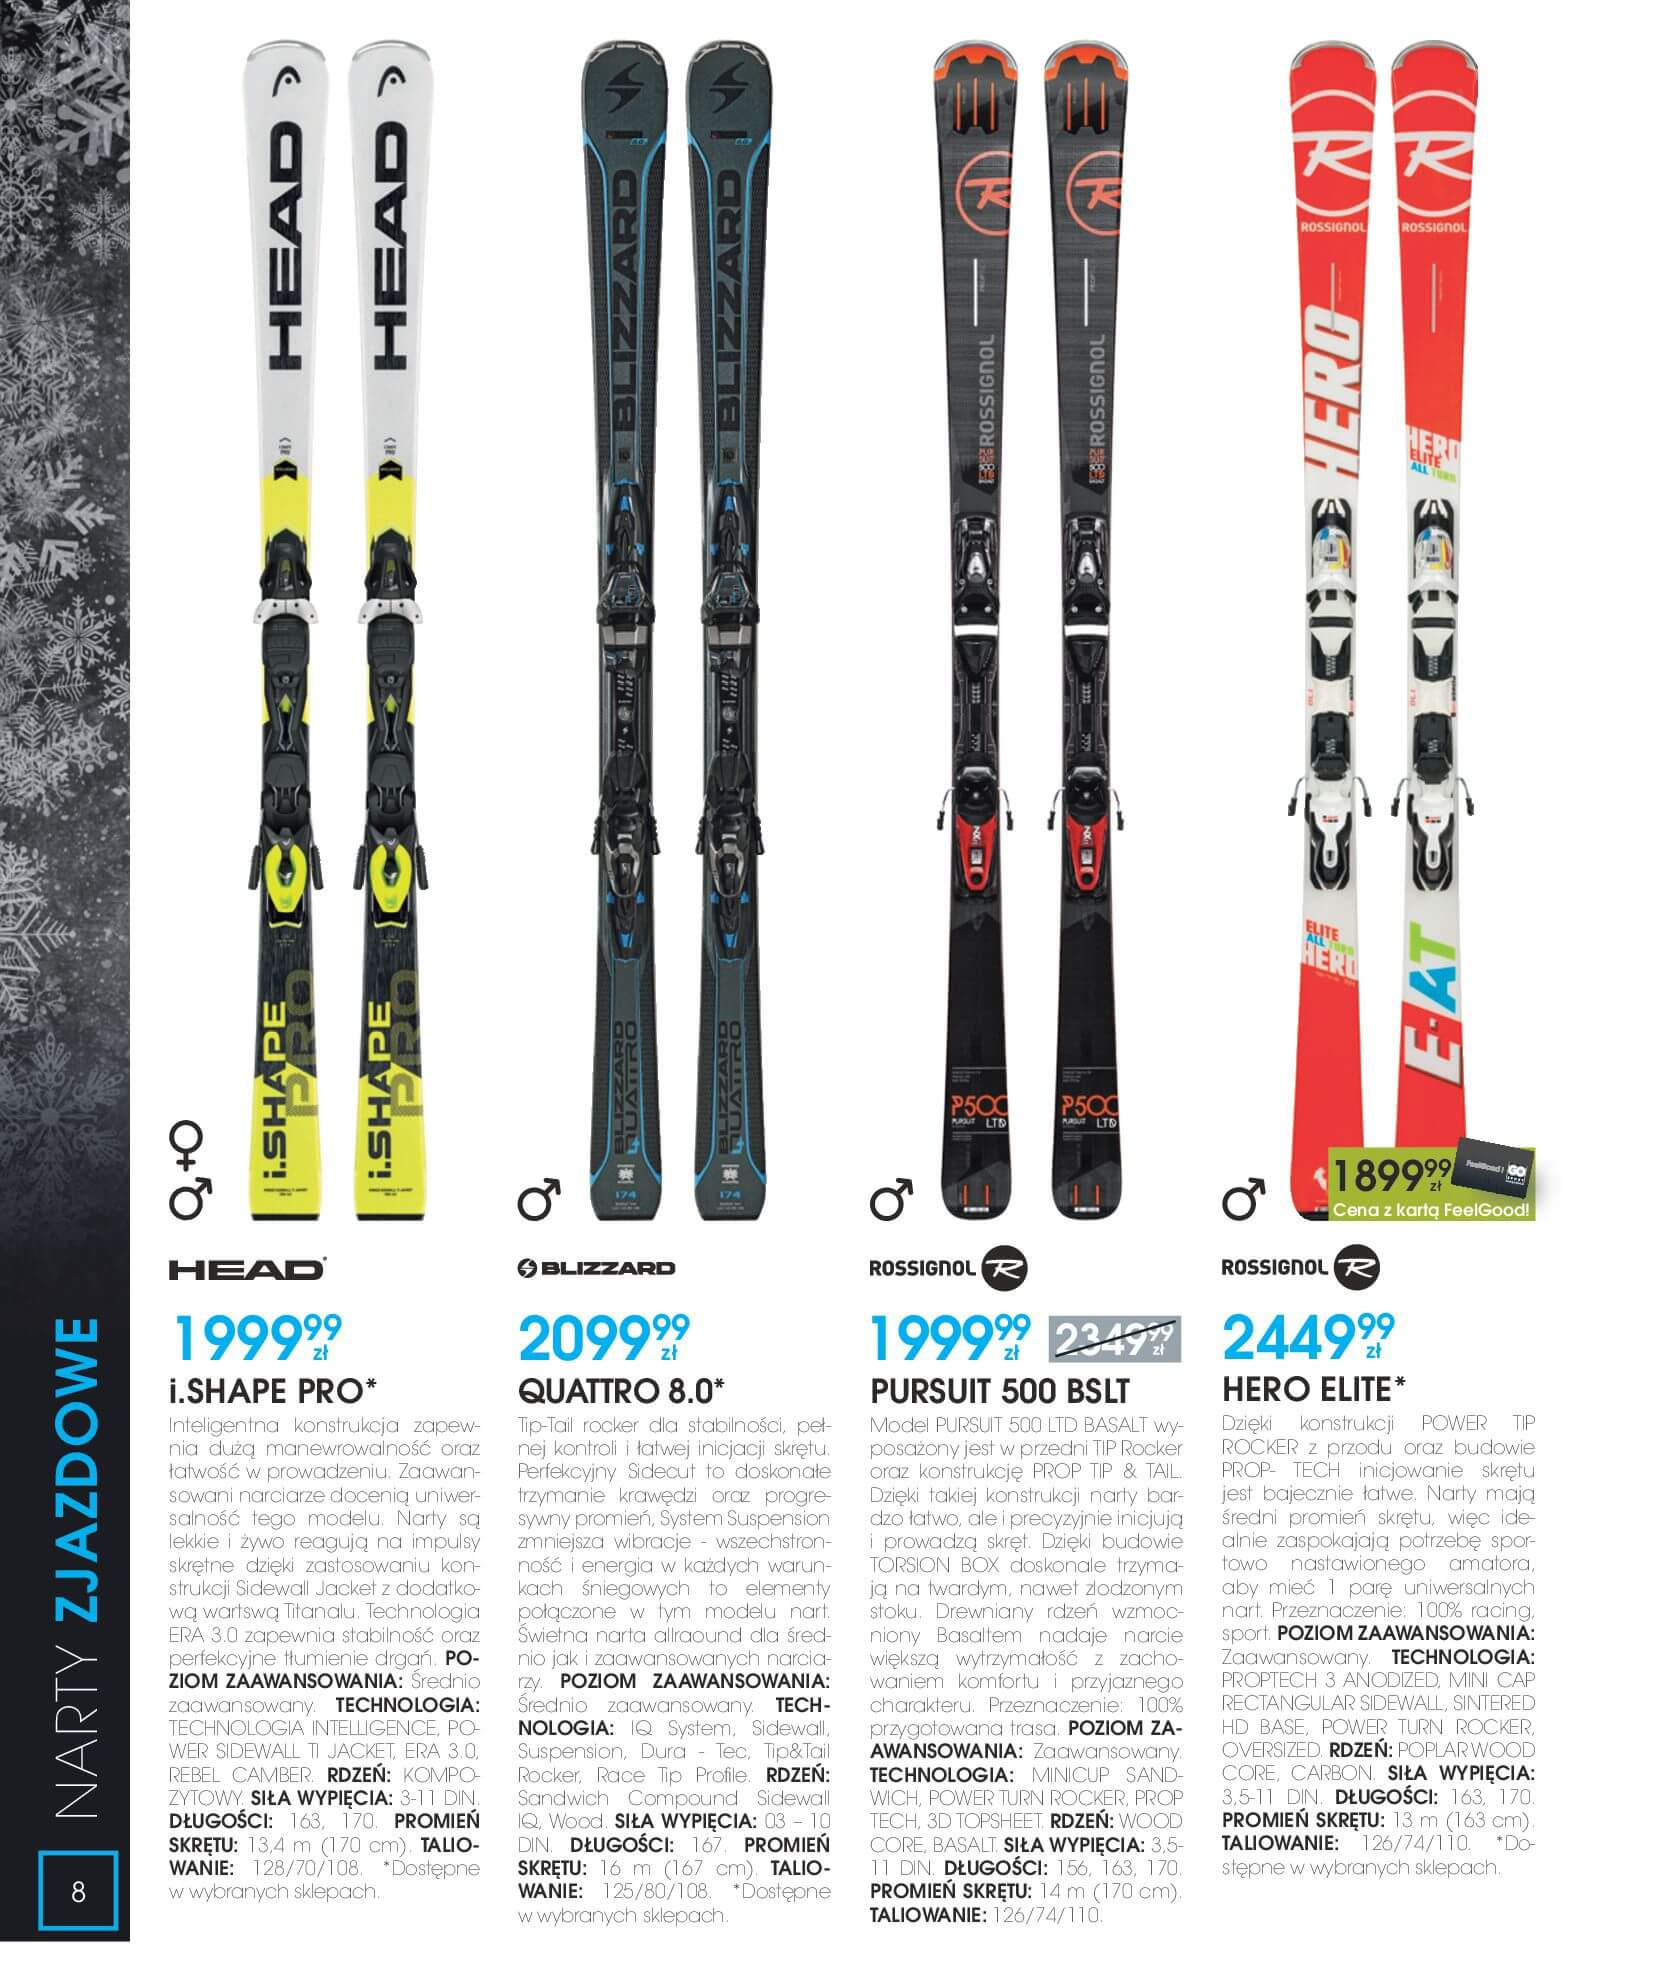 Gazetka Go Sport - Katalog Zima 2017/2018-12.11.2017-28.02.2018-page-8